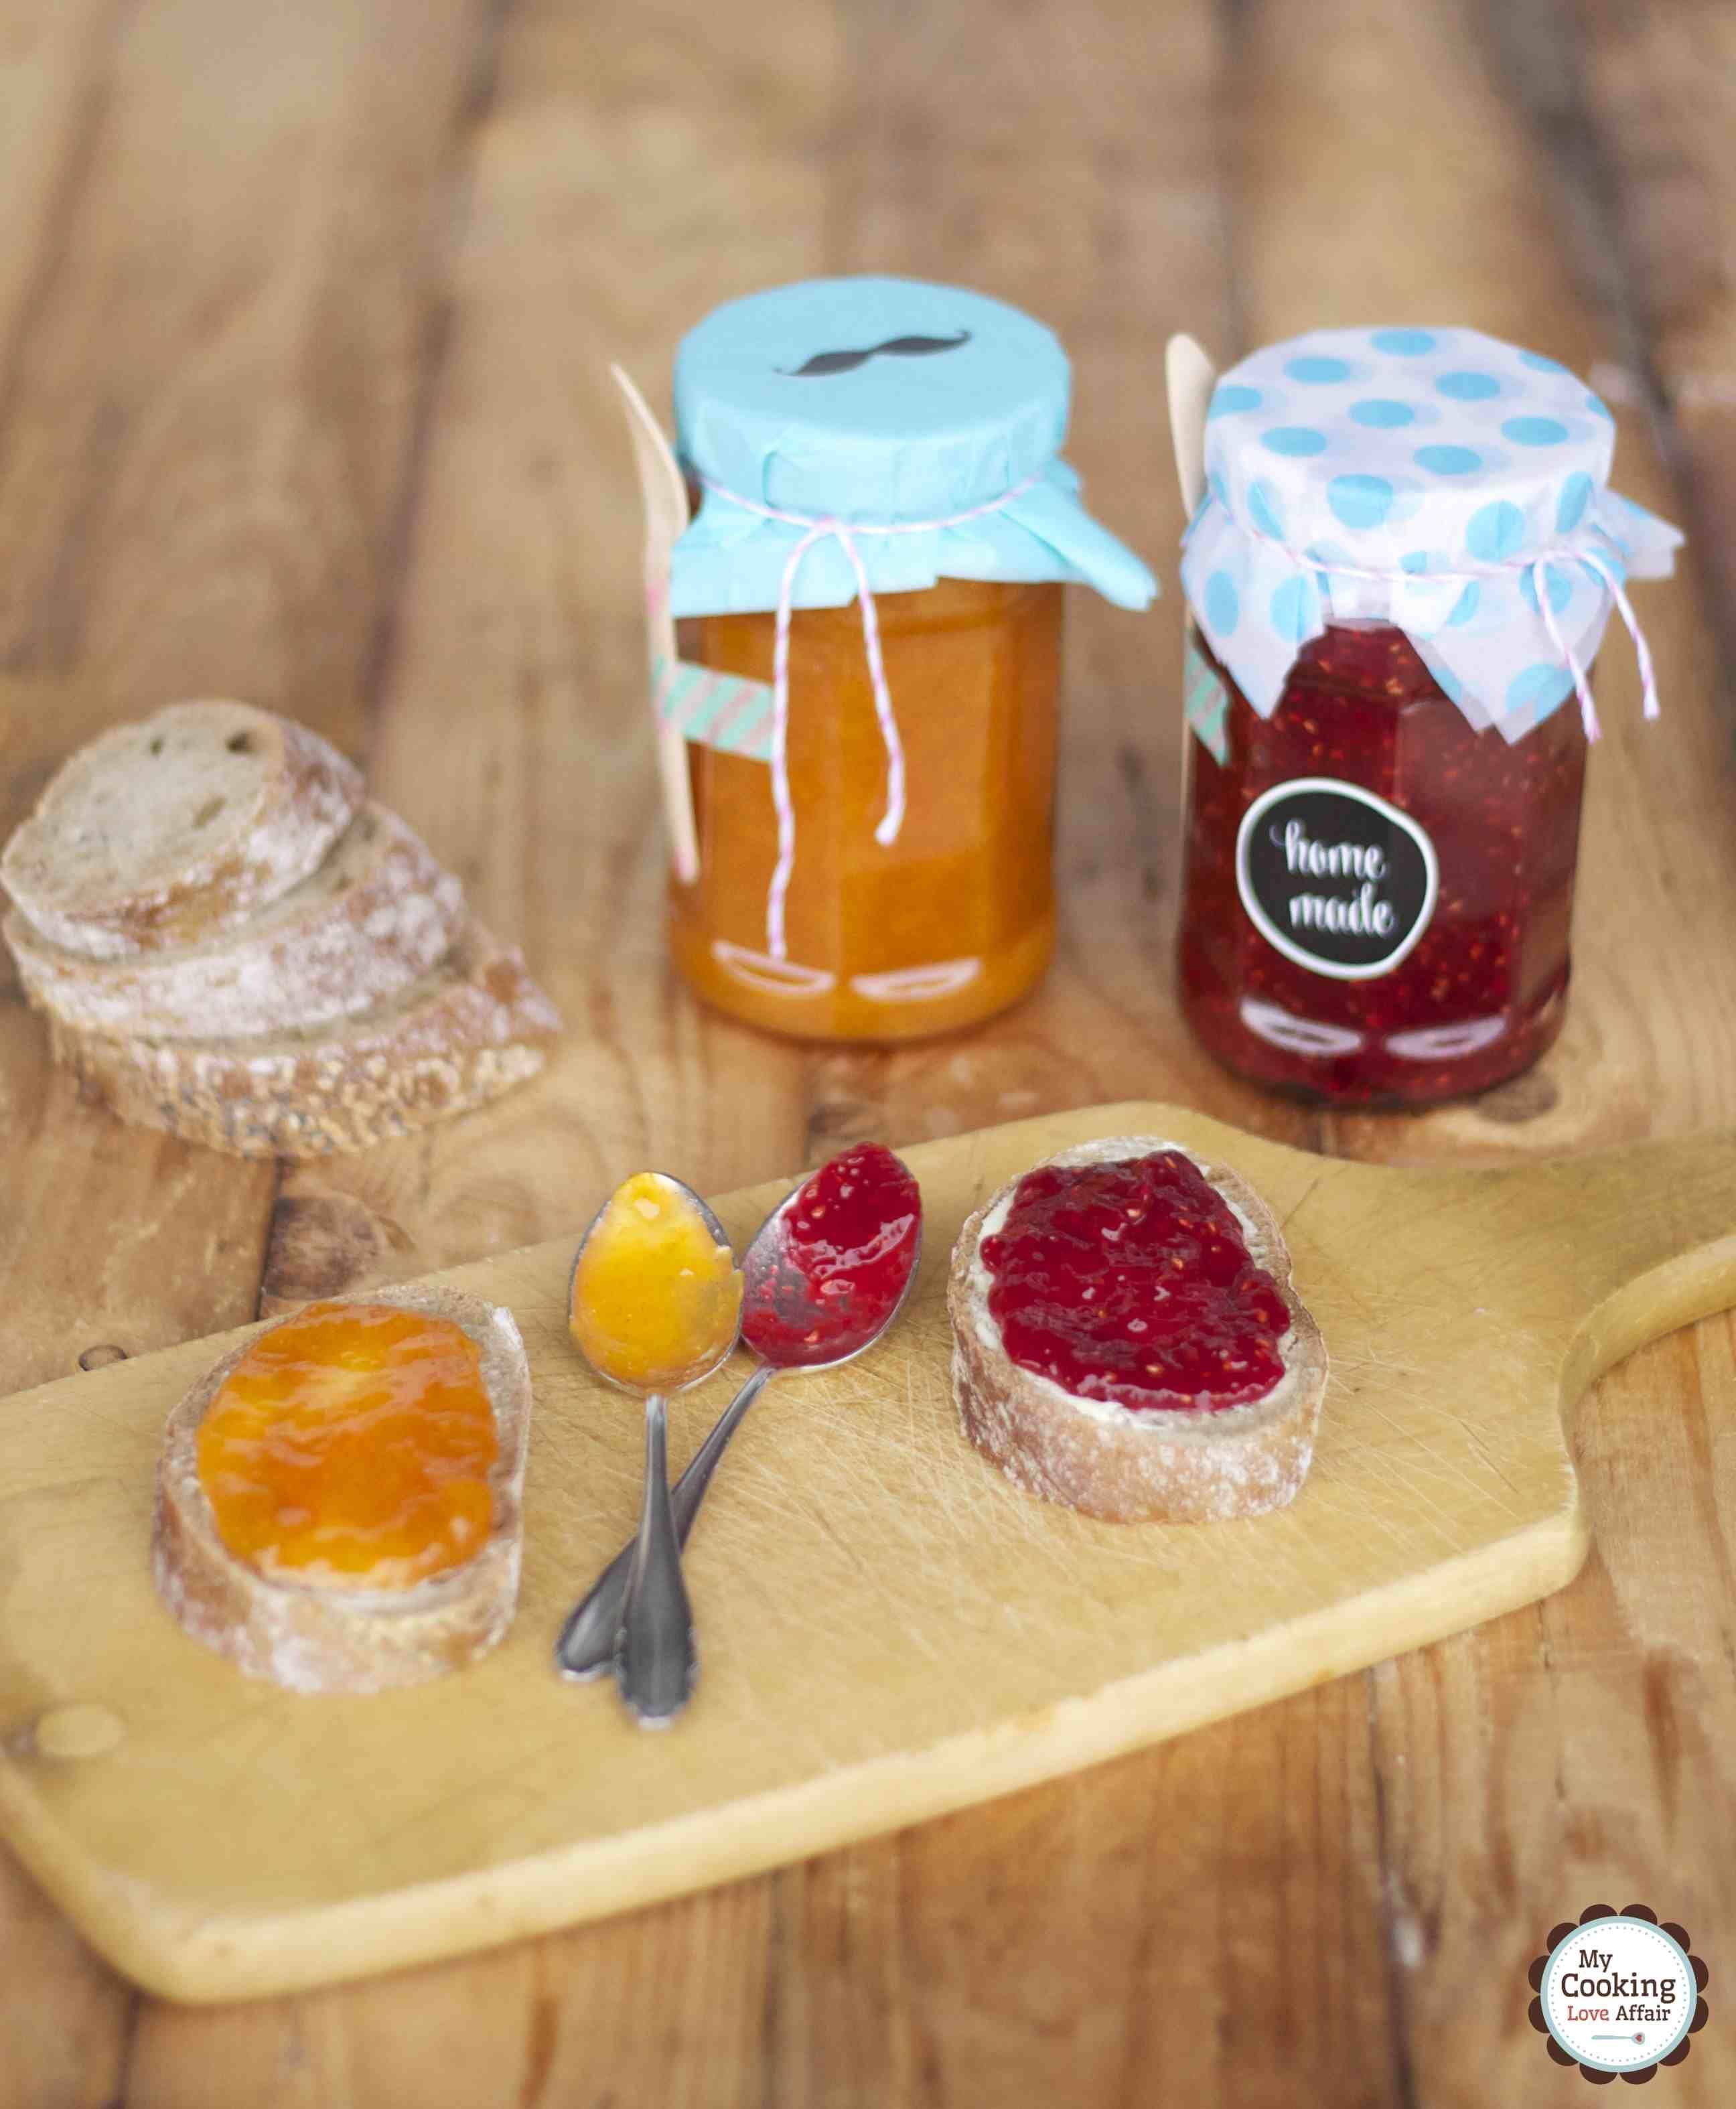 aprikosenmarmelade mit amaretto und vanille himbeer aprikosen marmelade jams pinterest. Black Bedroom Furniture Sets. Home Design Ideas